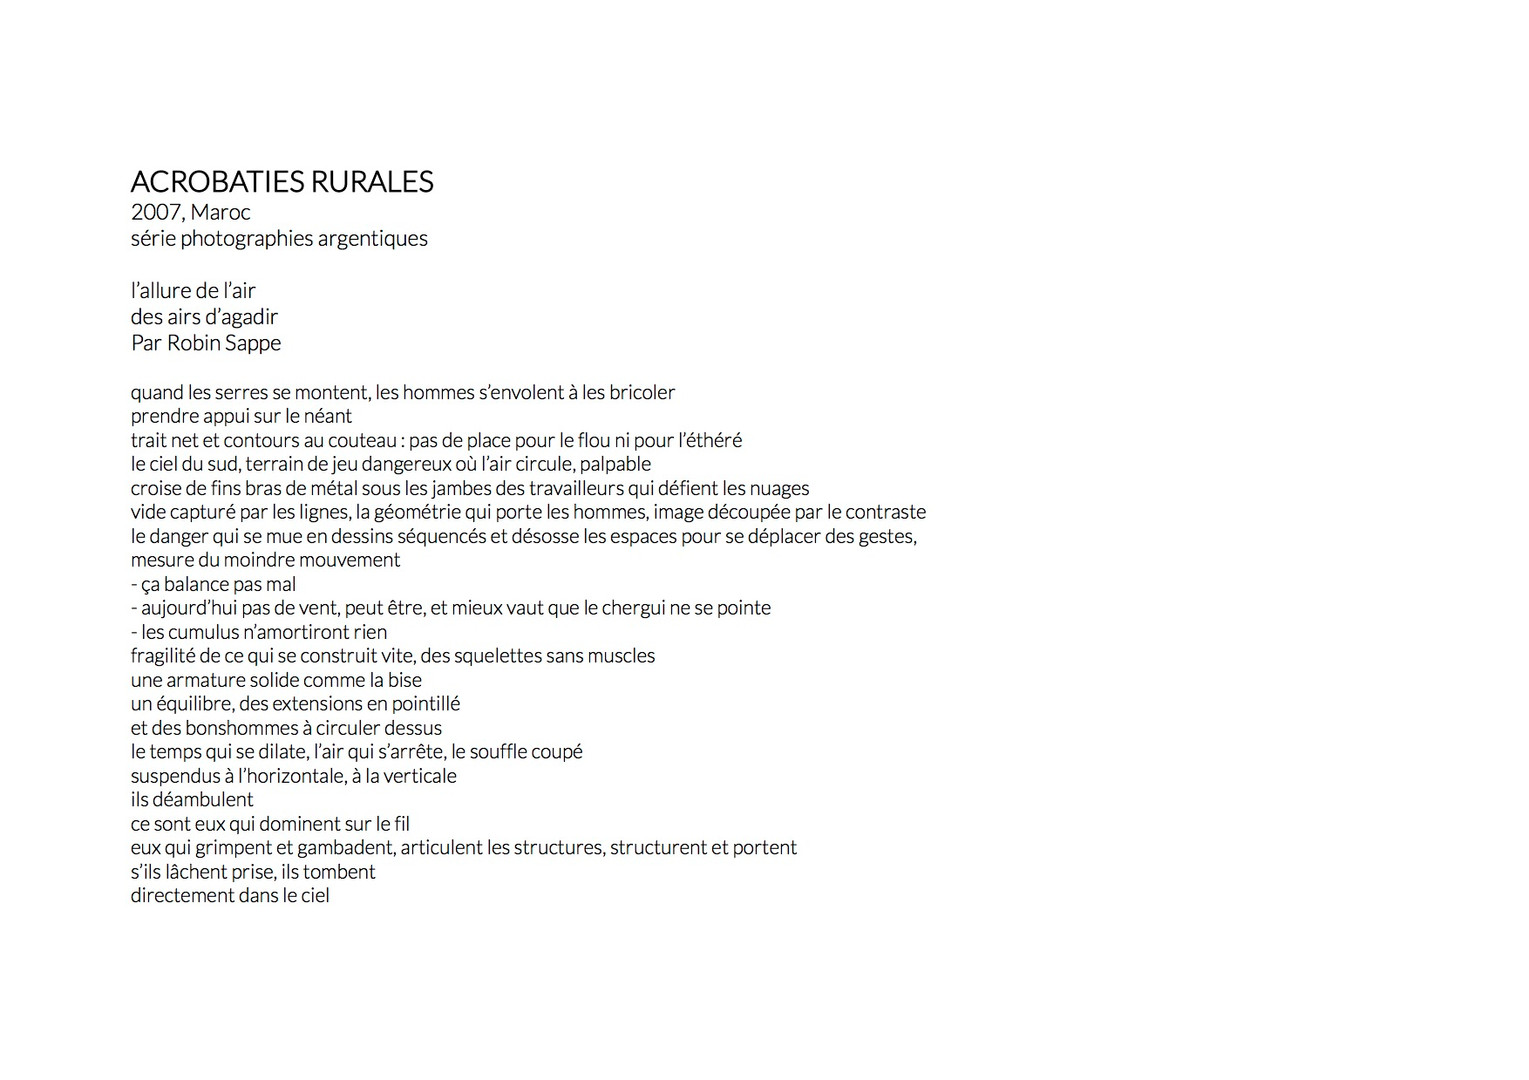 ACROBATIES RURALES - LATO.JPG